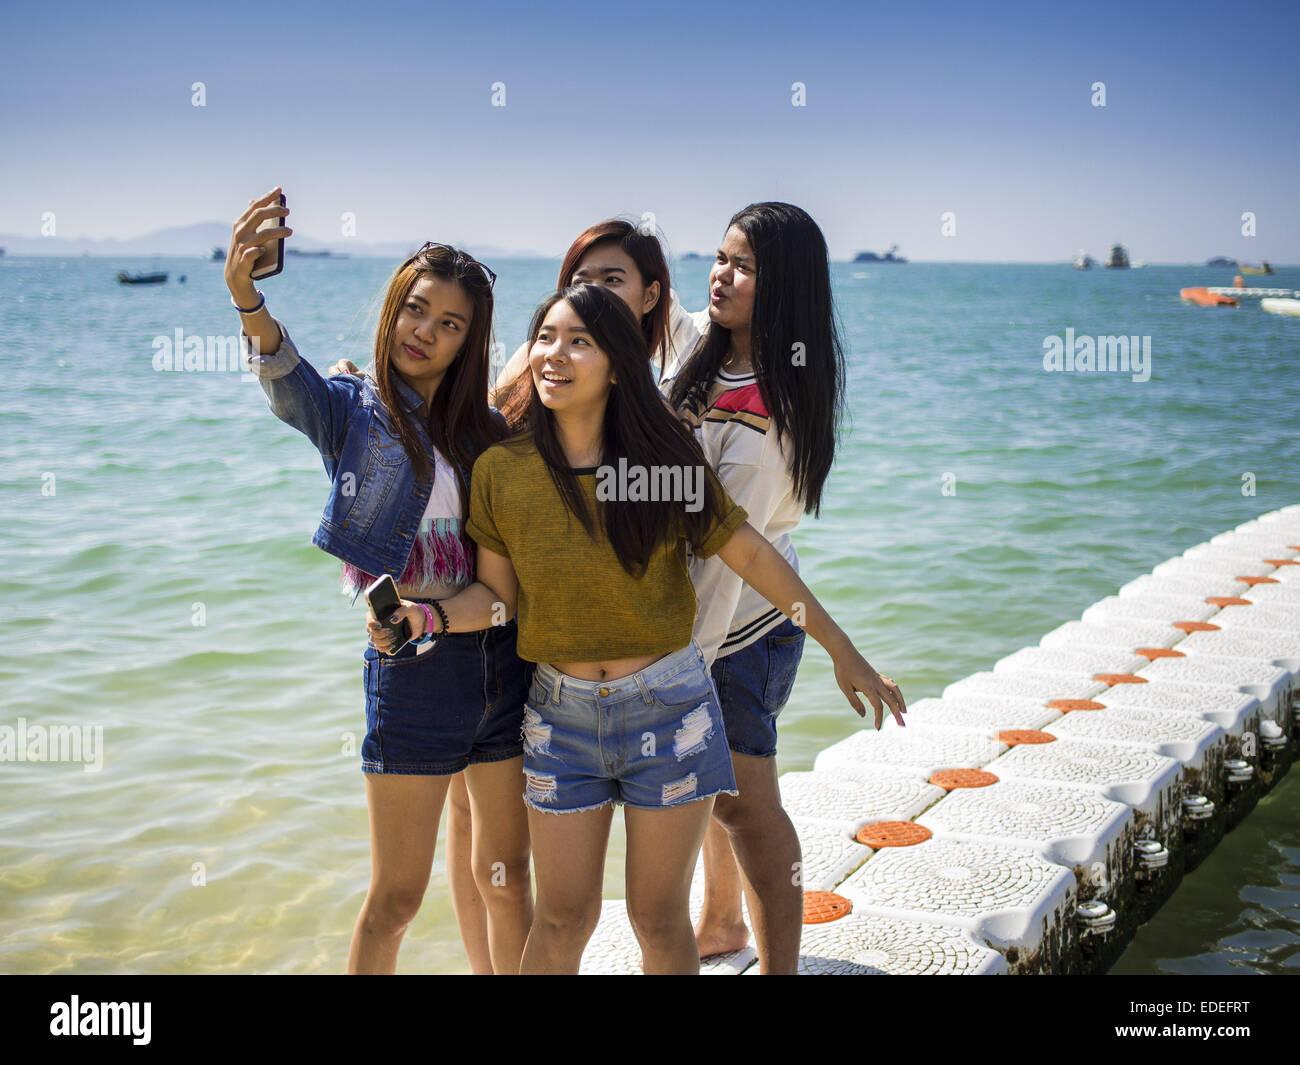 Pattaya Chonburi Thailand 6th Jan 2015 Thai Women